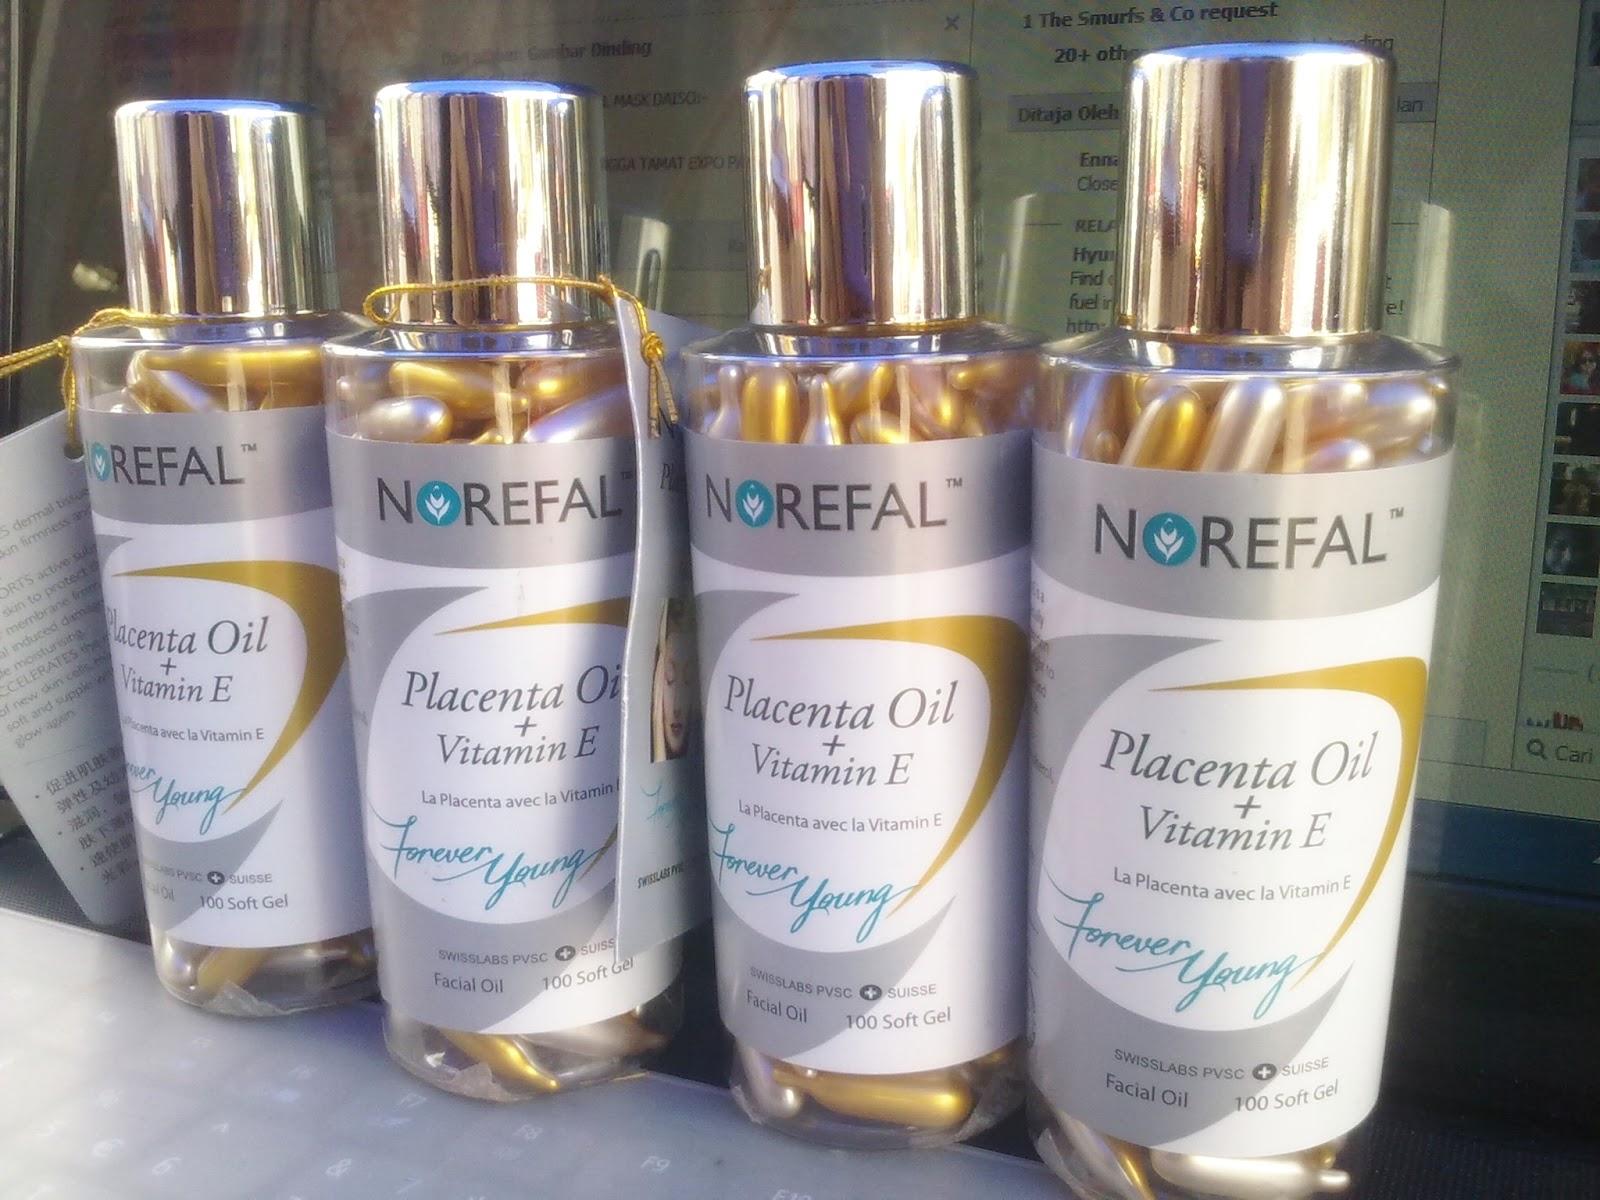 1 Norefal Placenta Oil + Vitamin E (Soft Gel)Sumijelly Weblog